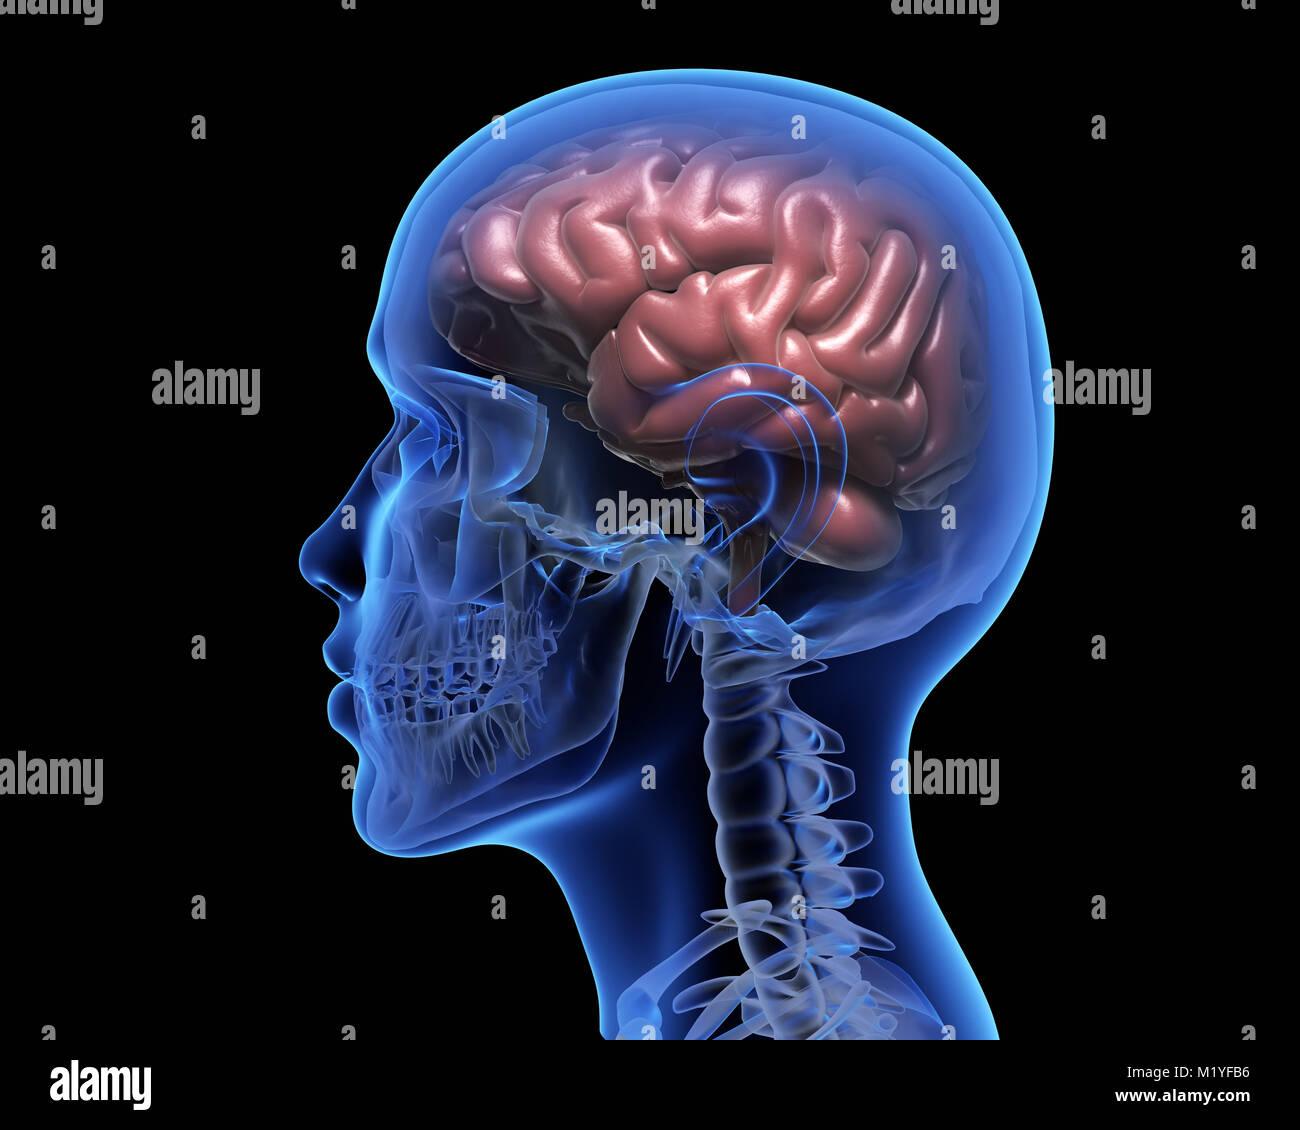 Human brain over black background. 3D illustration - Stock Image